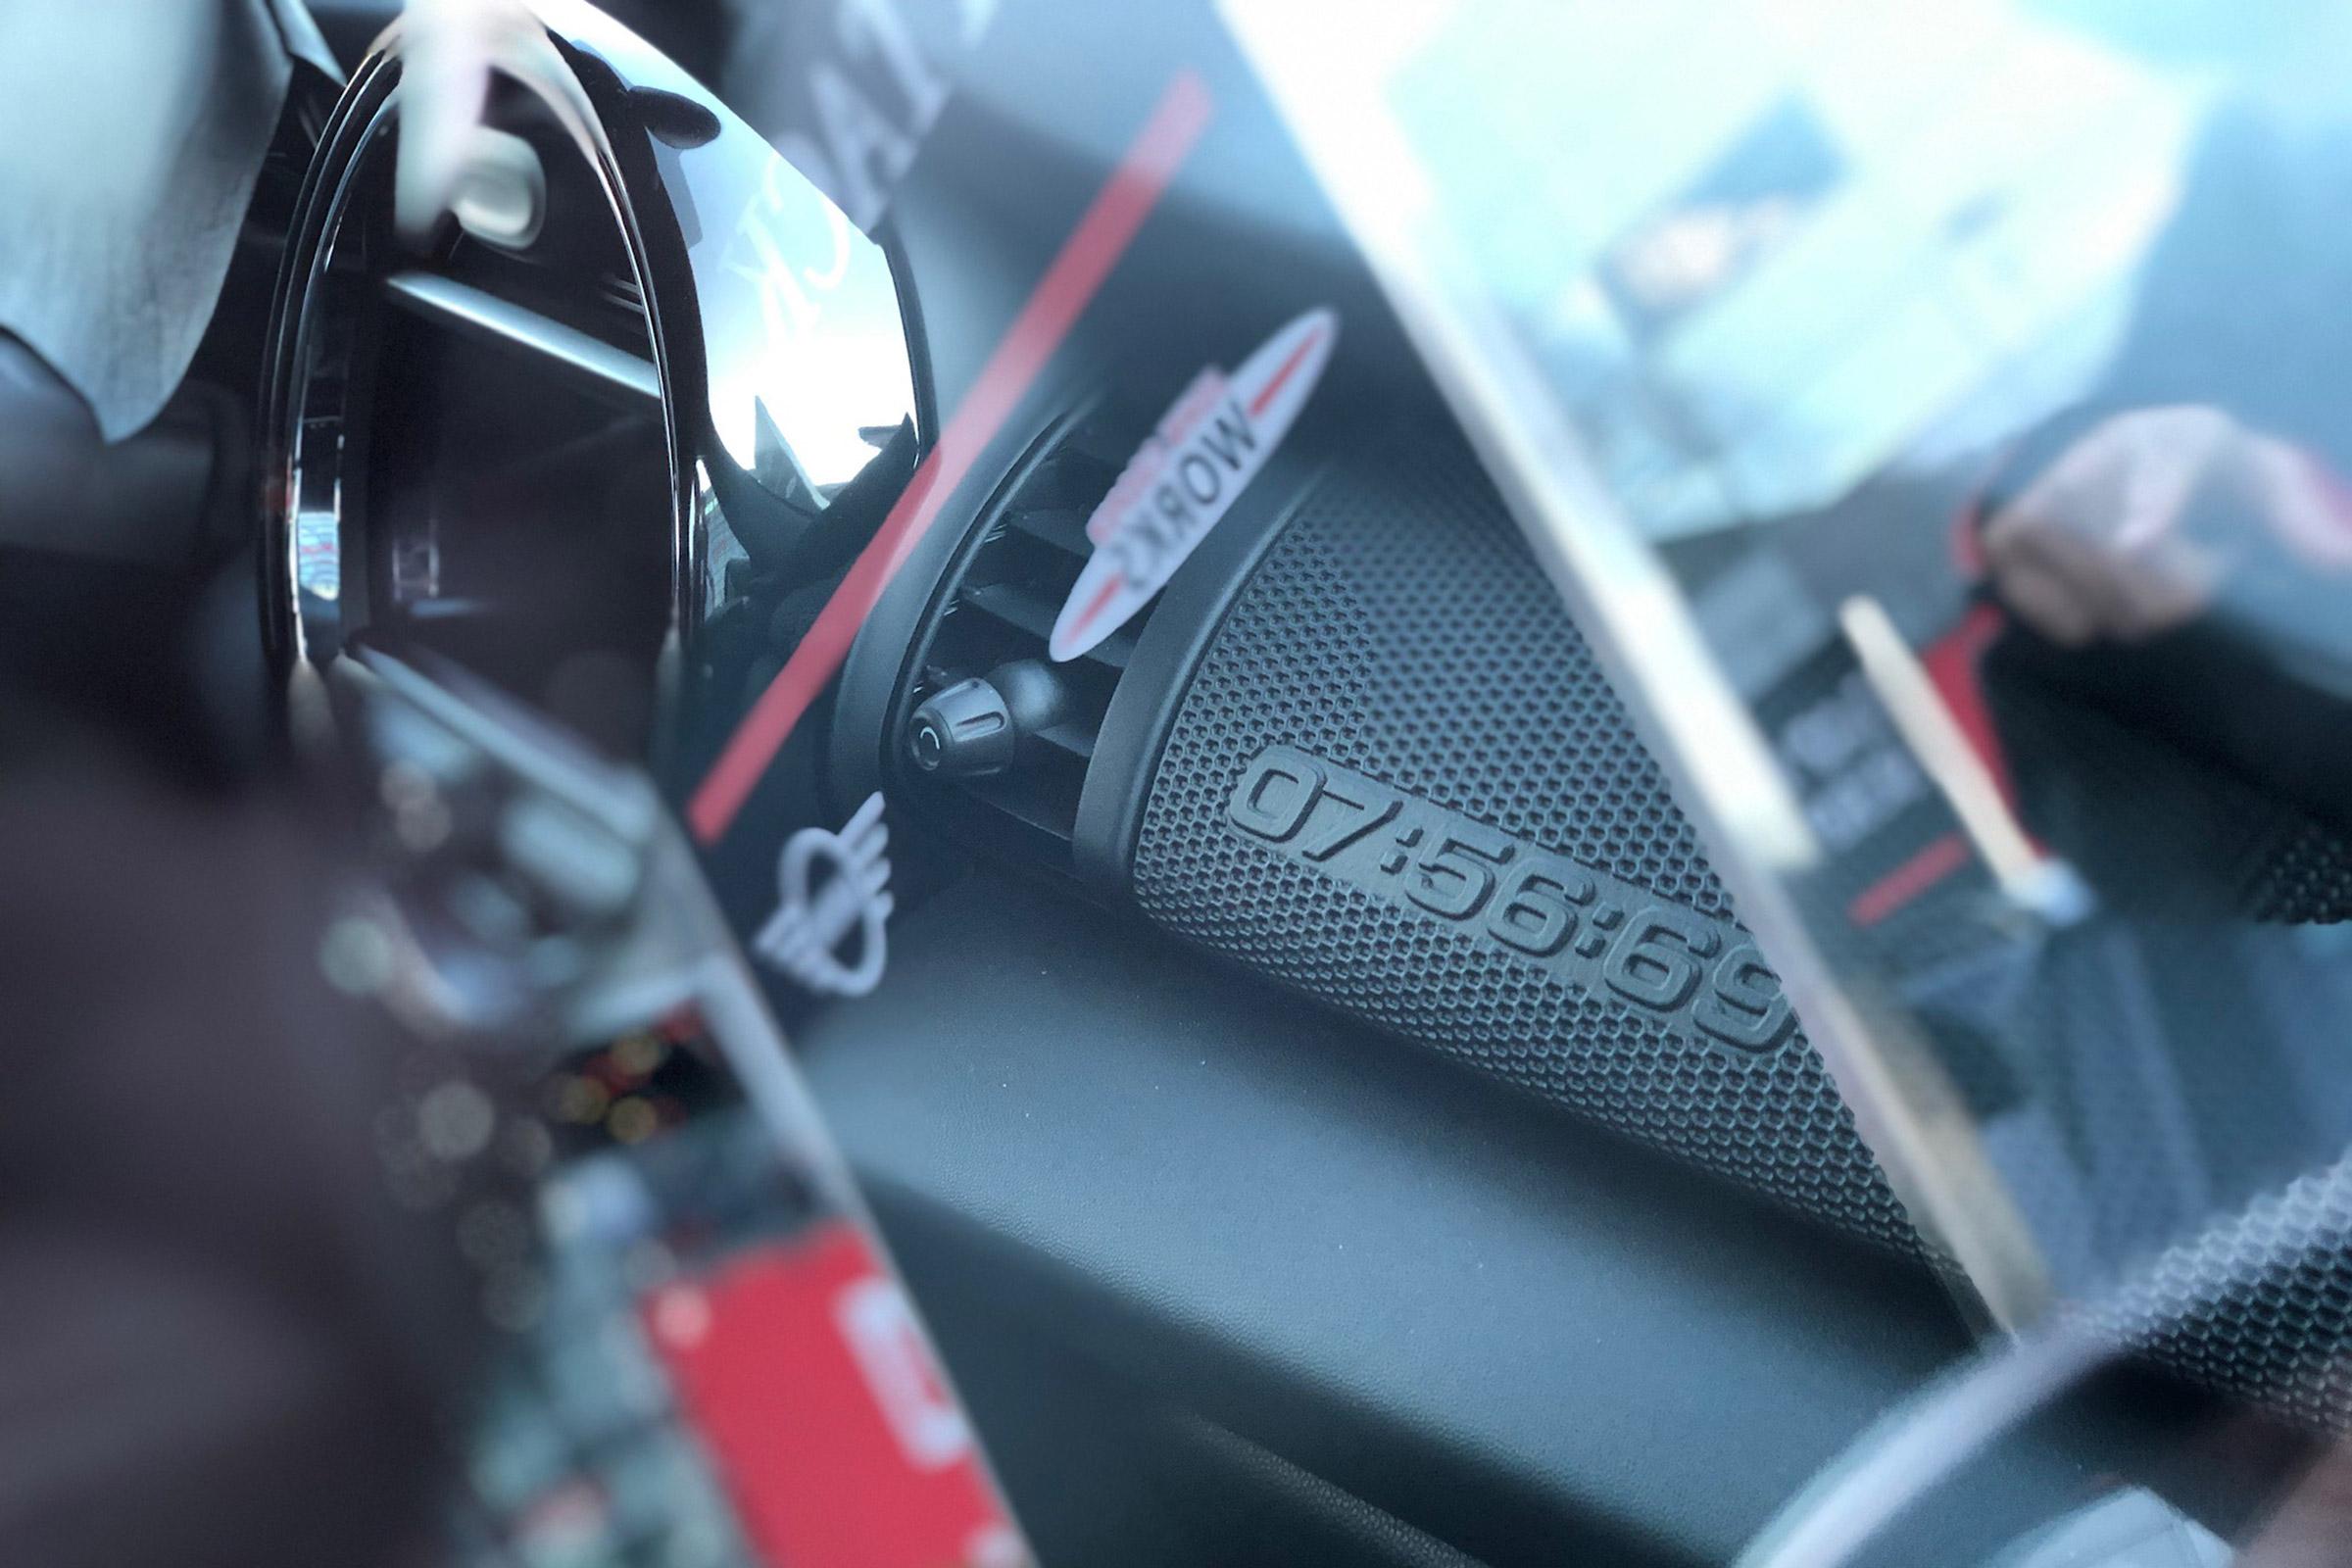 Next Generation Mini Jcw Gp Getting Closer To Production Evo